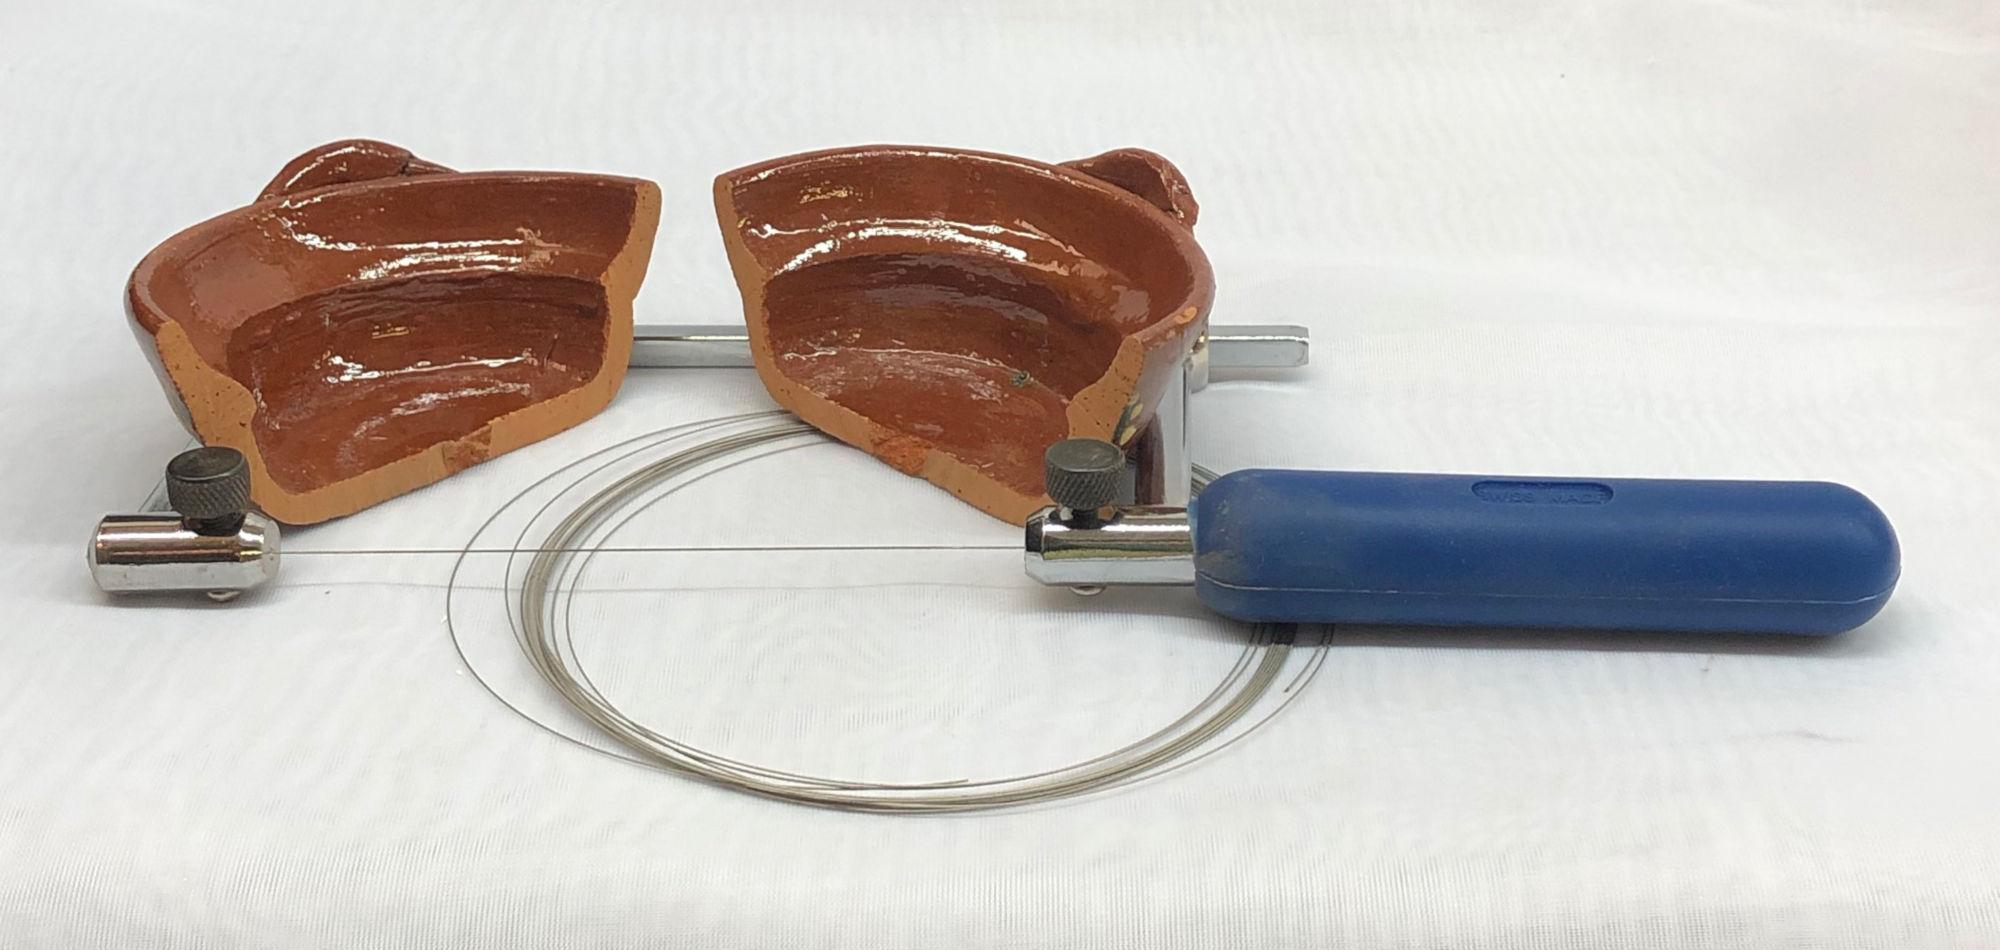 A terra cotta dish has been cut in half using a hand diamond saw